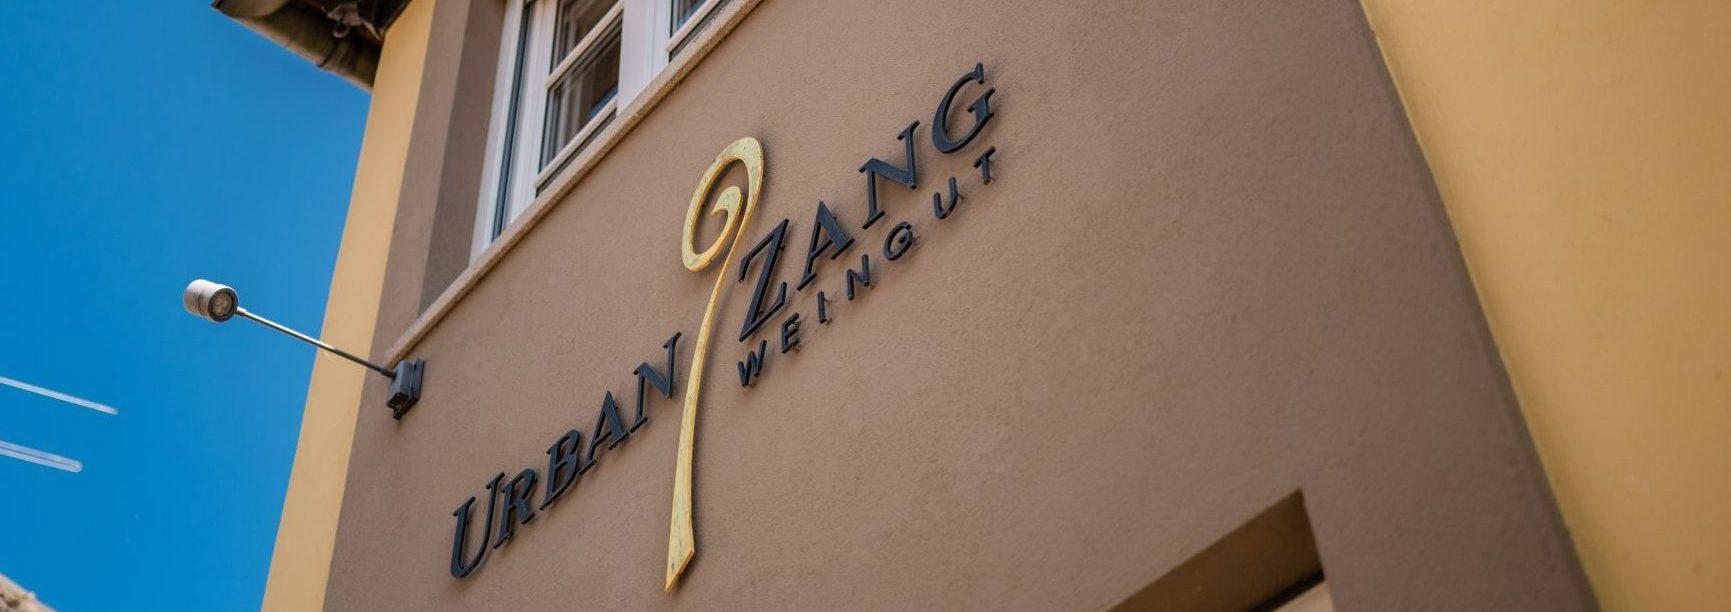 Weingut Urban Zang